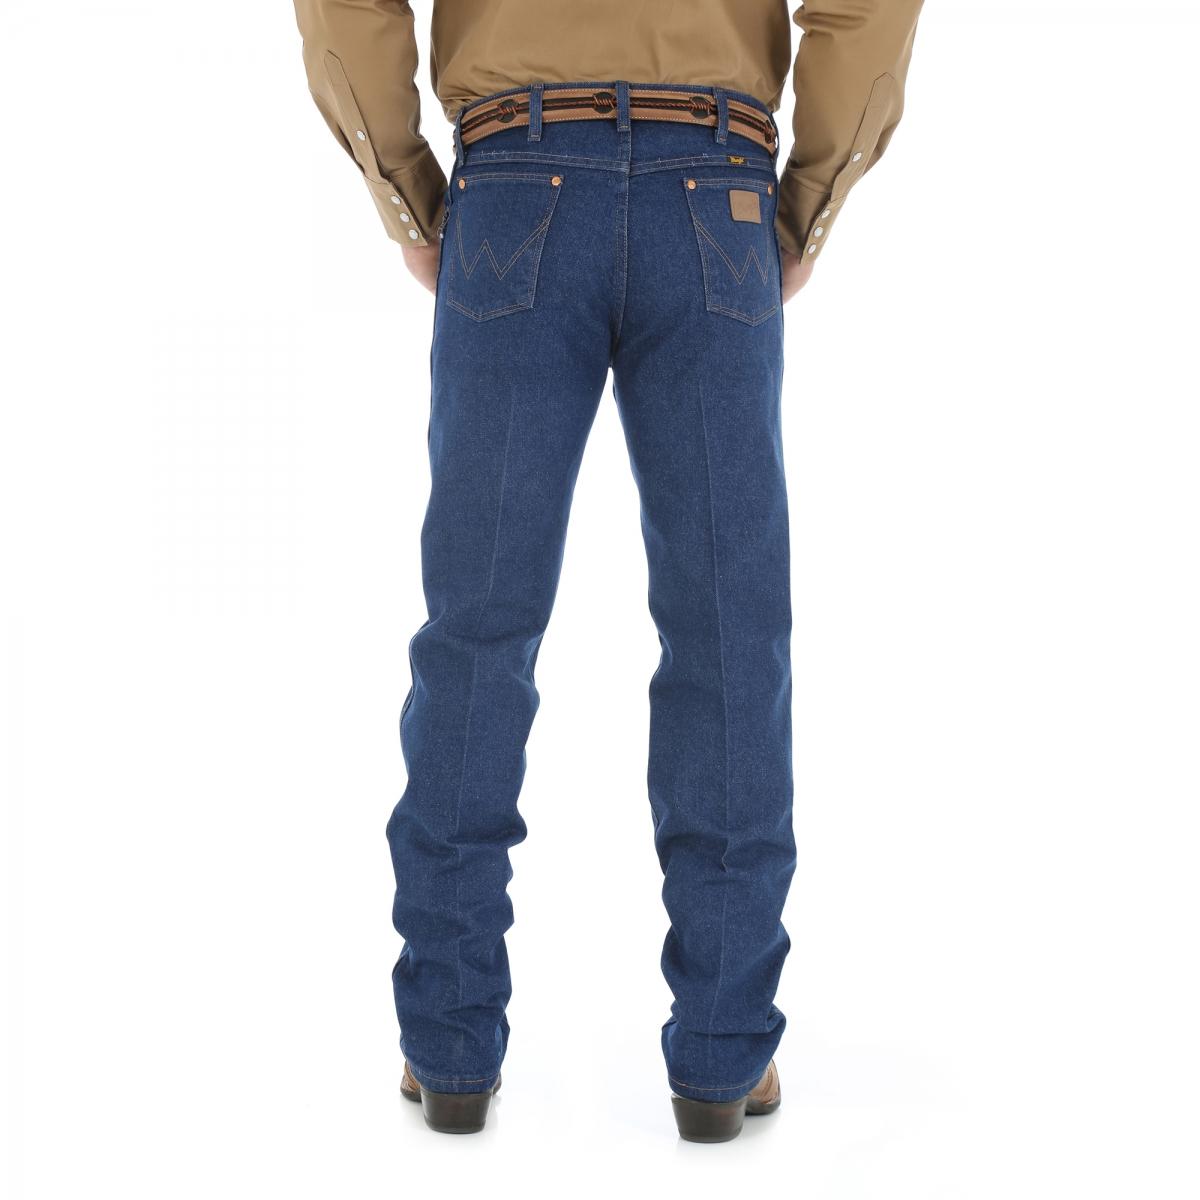 jeans_wrangler_13mwzpw_back